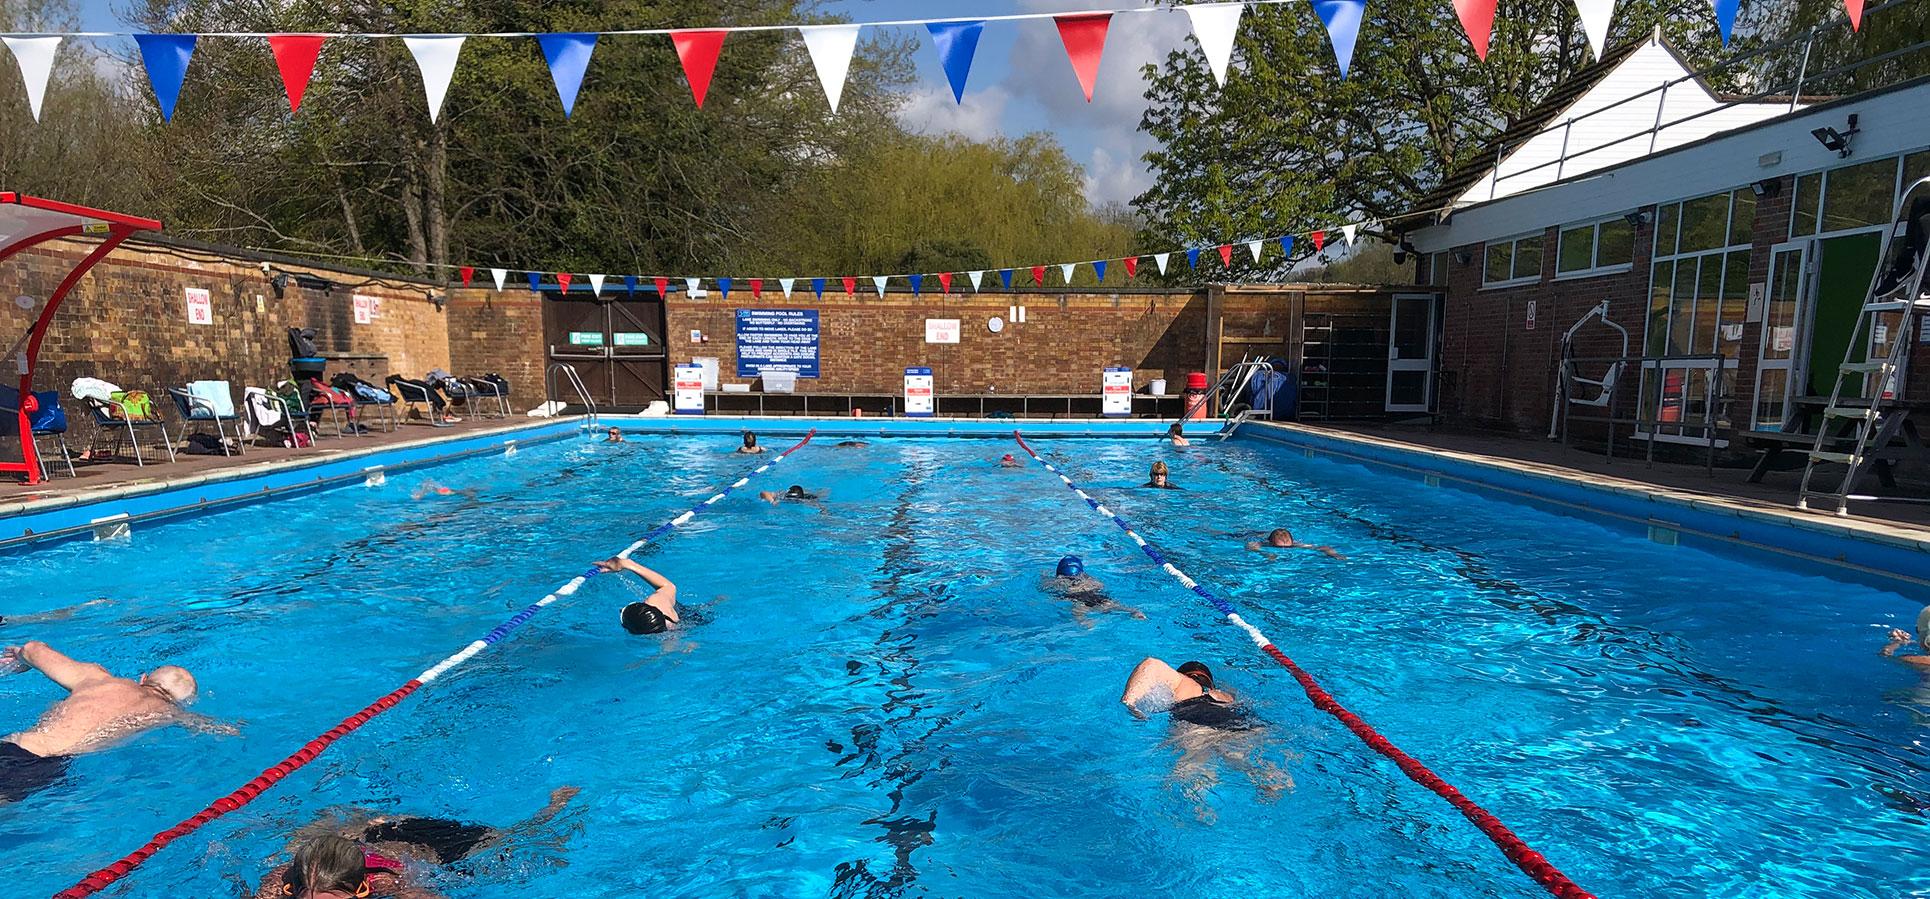 Chesham lido with three lanes for swimming